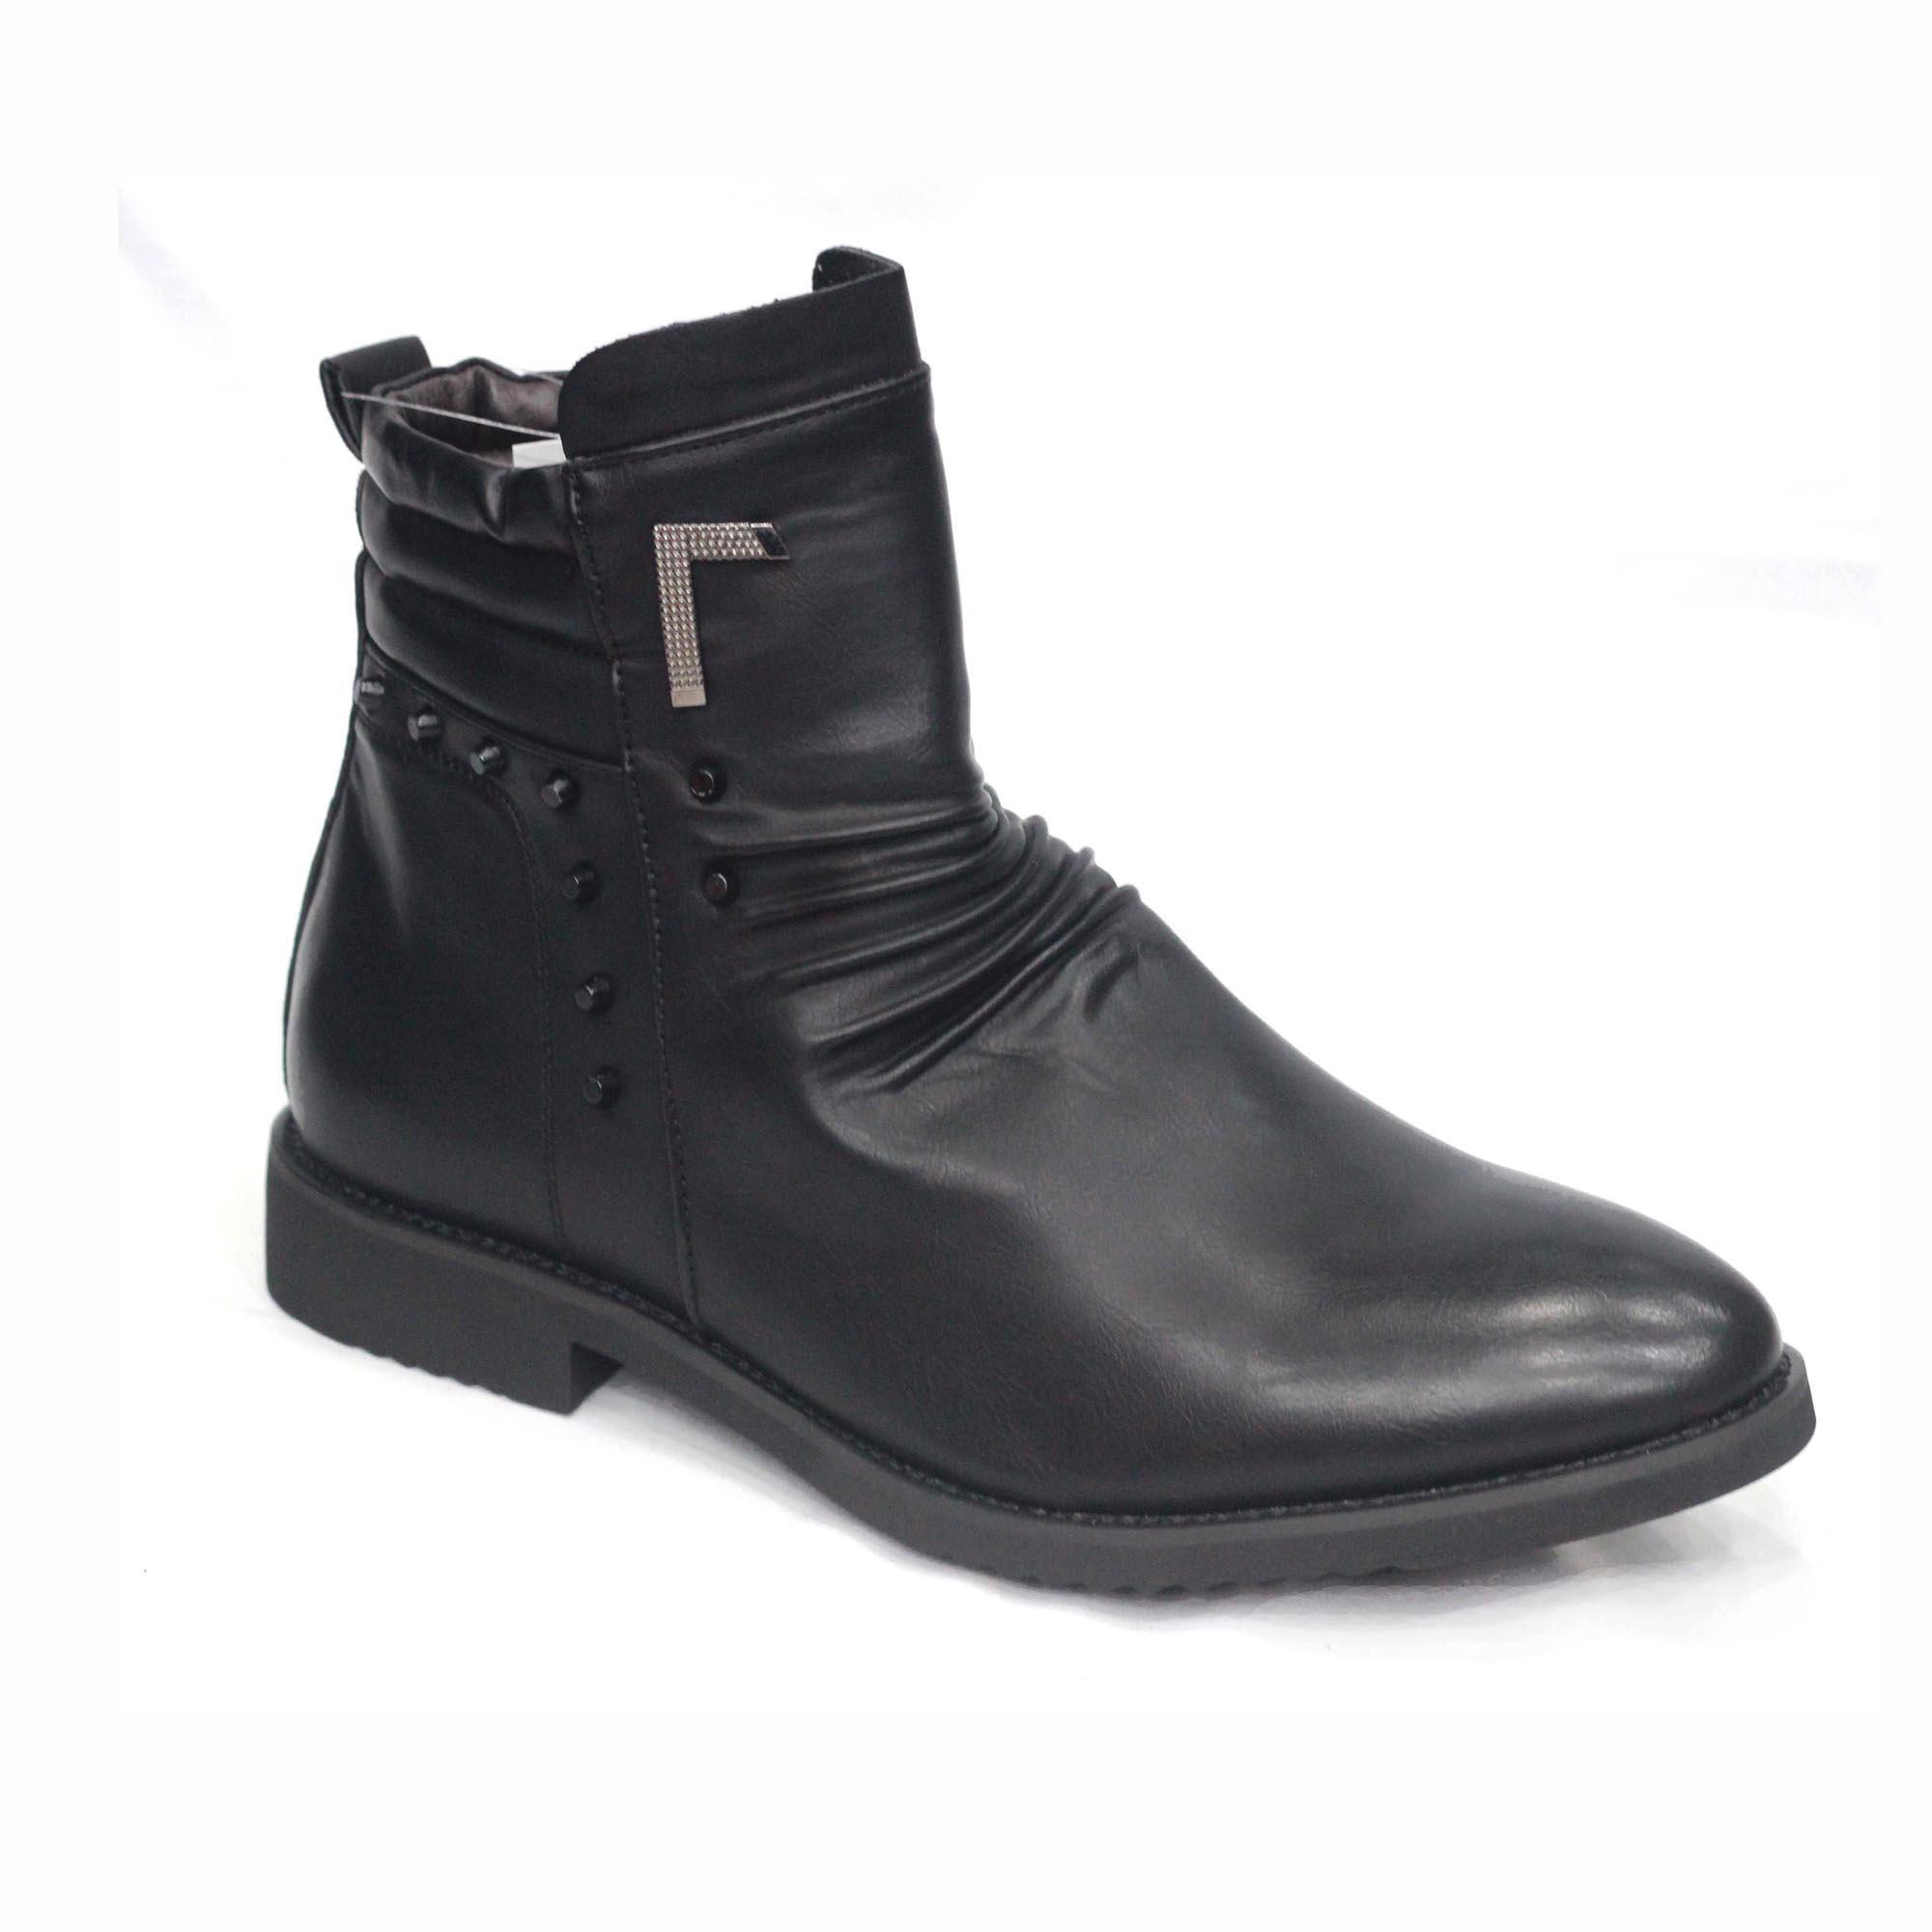 b4cfc990e3c1c Men's Shoes Online - Buy Shoes For Men in Bangladesh - Daraz.com.bd